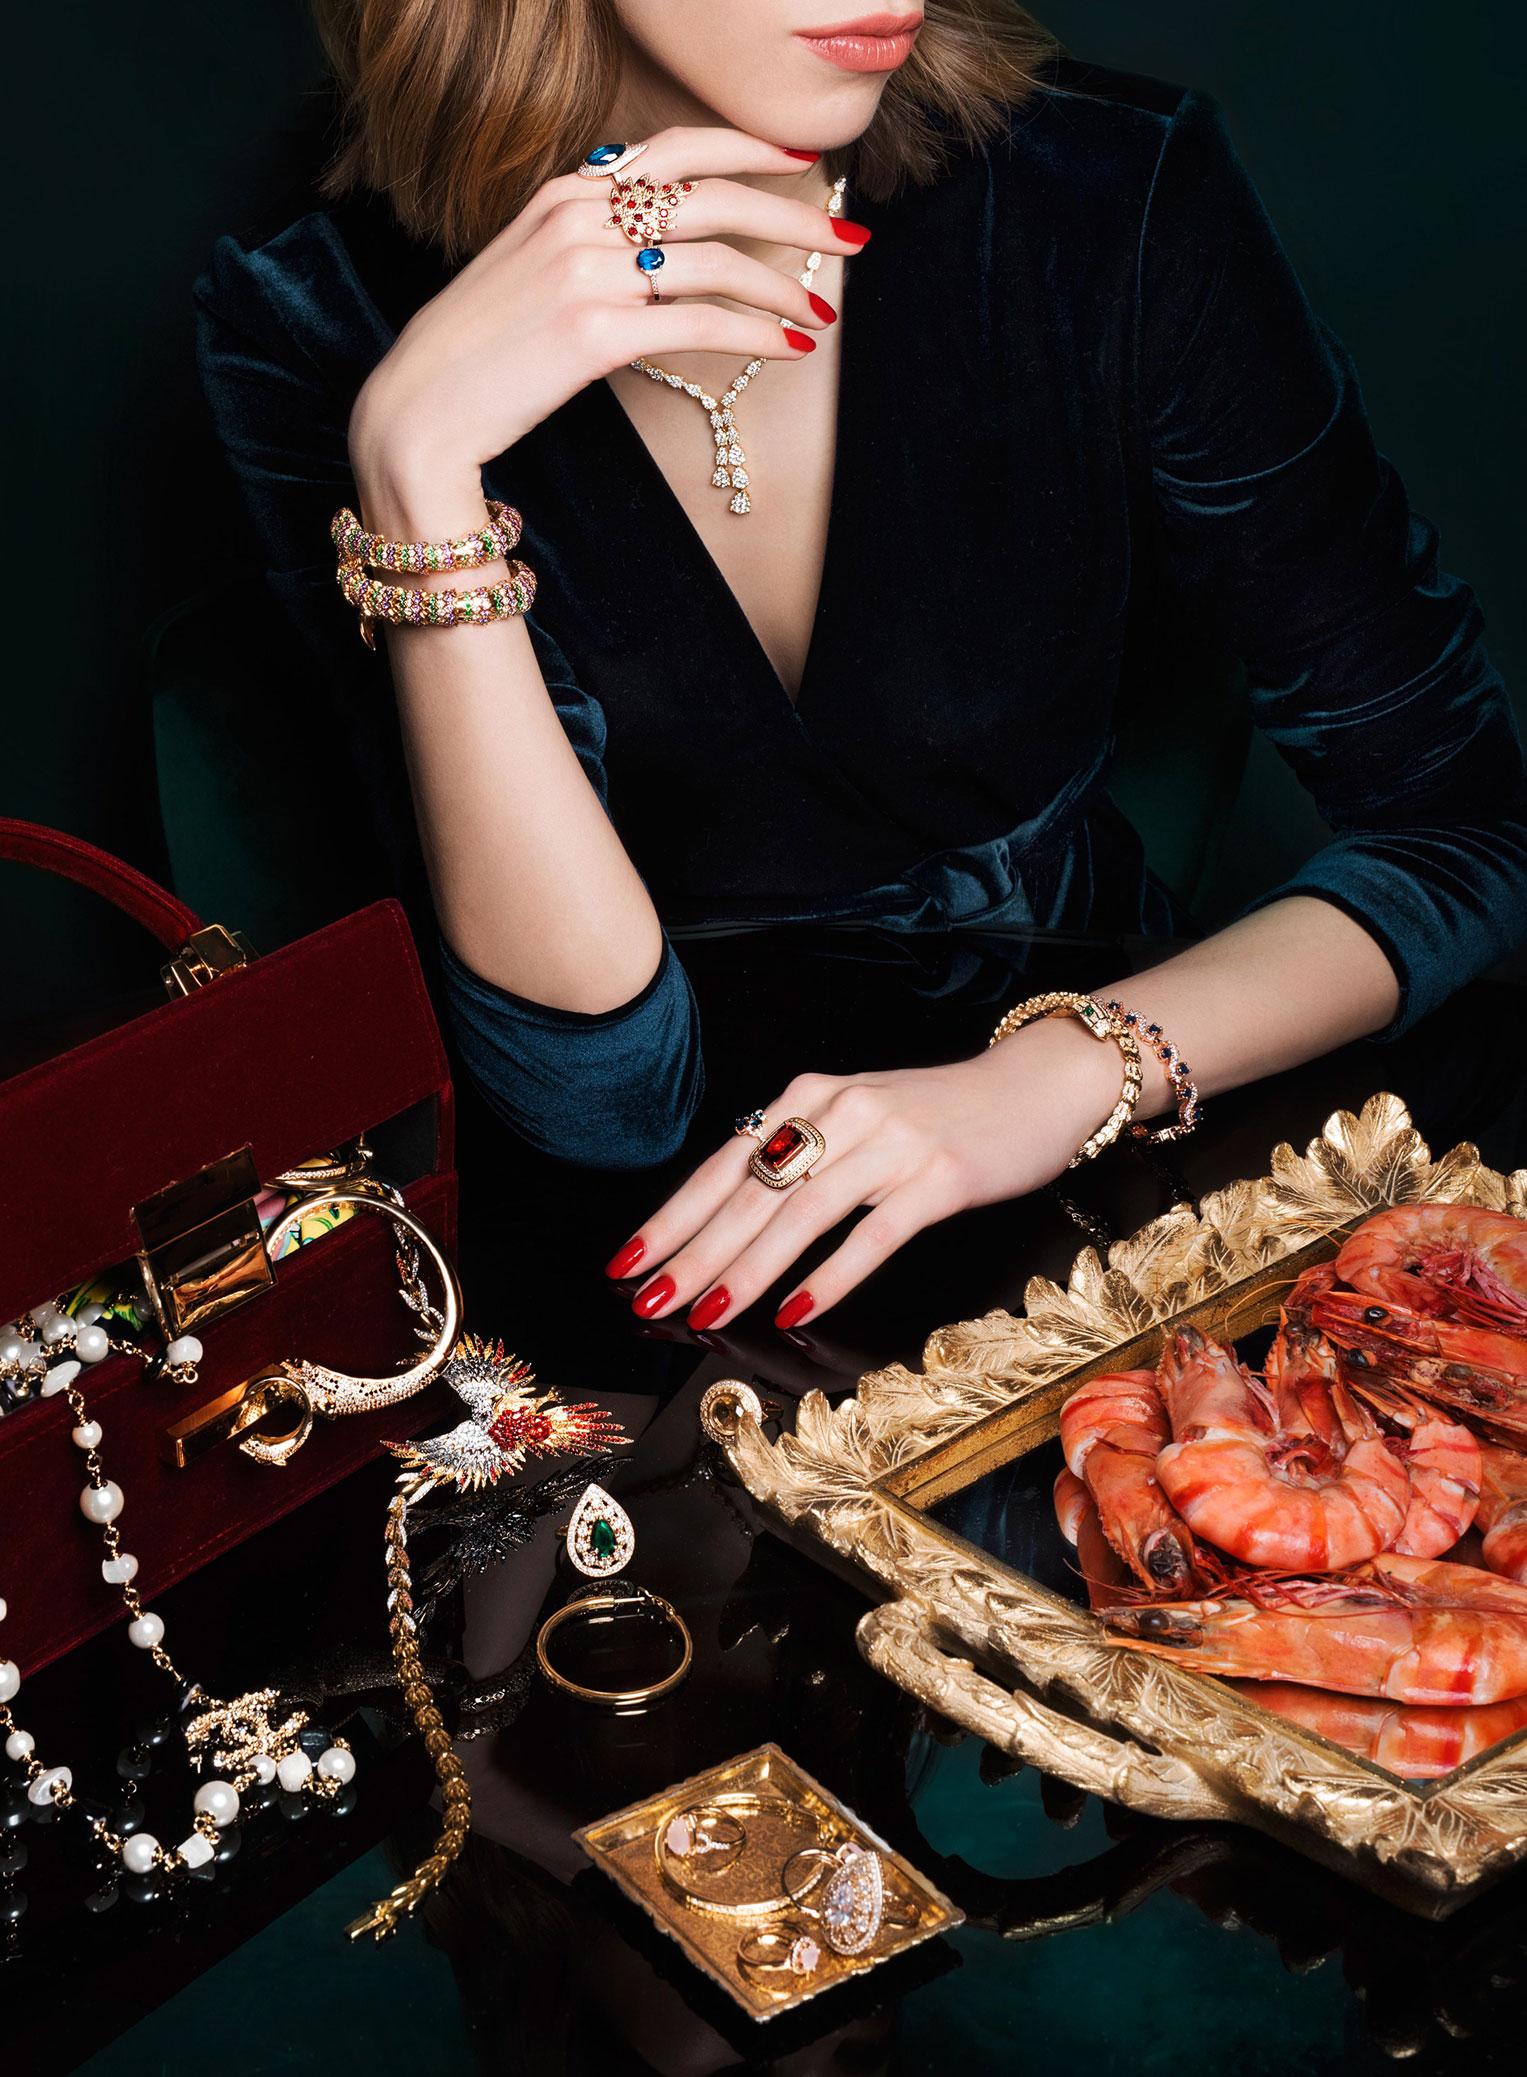 Валерия Тарасенко / Valeria Tarasenko by Alla Parhimovich / Fashion Collection february 2019